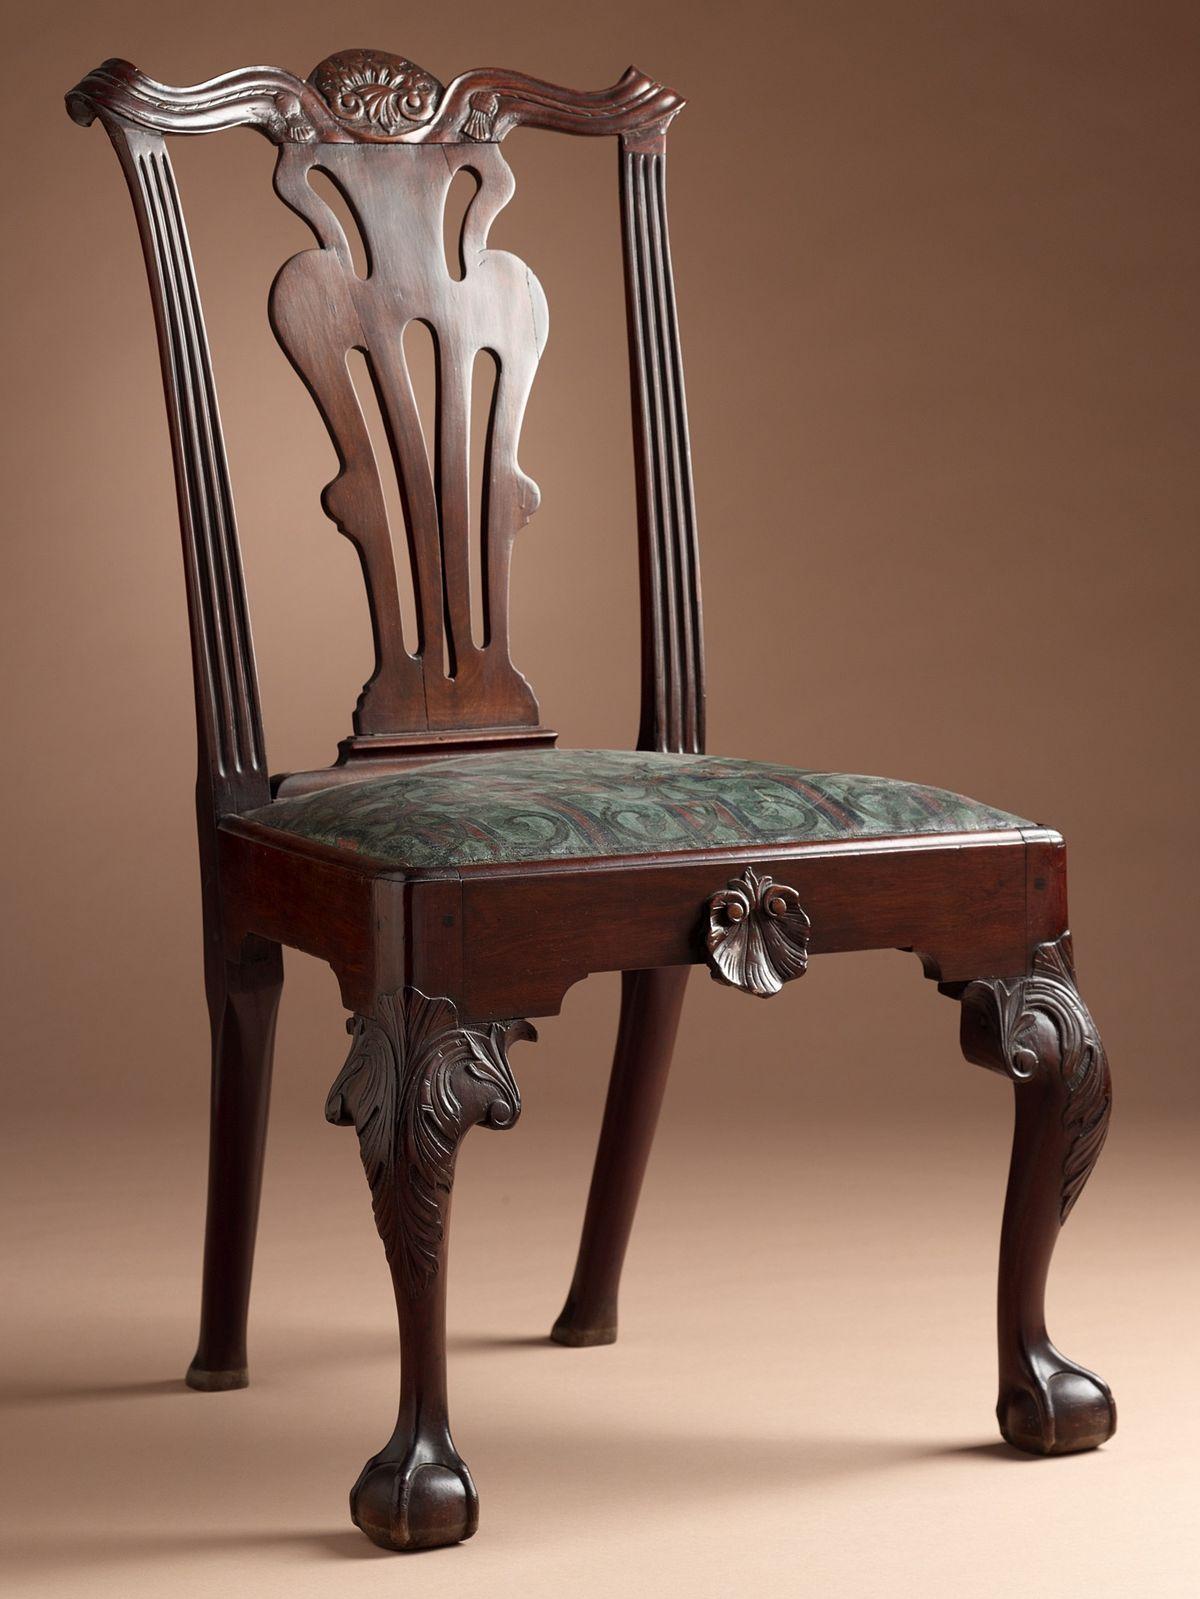 dillon chair 1 2 danish kneeling 猫足 wikipedia